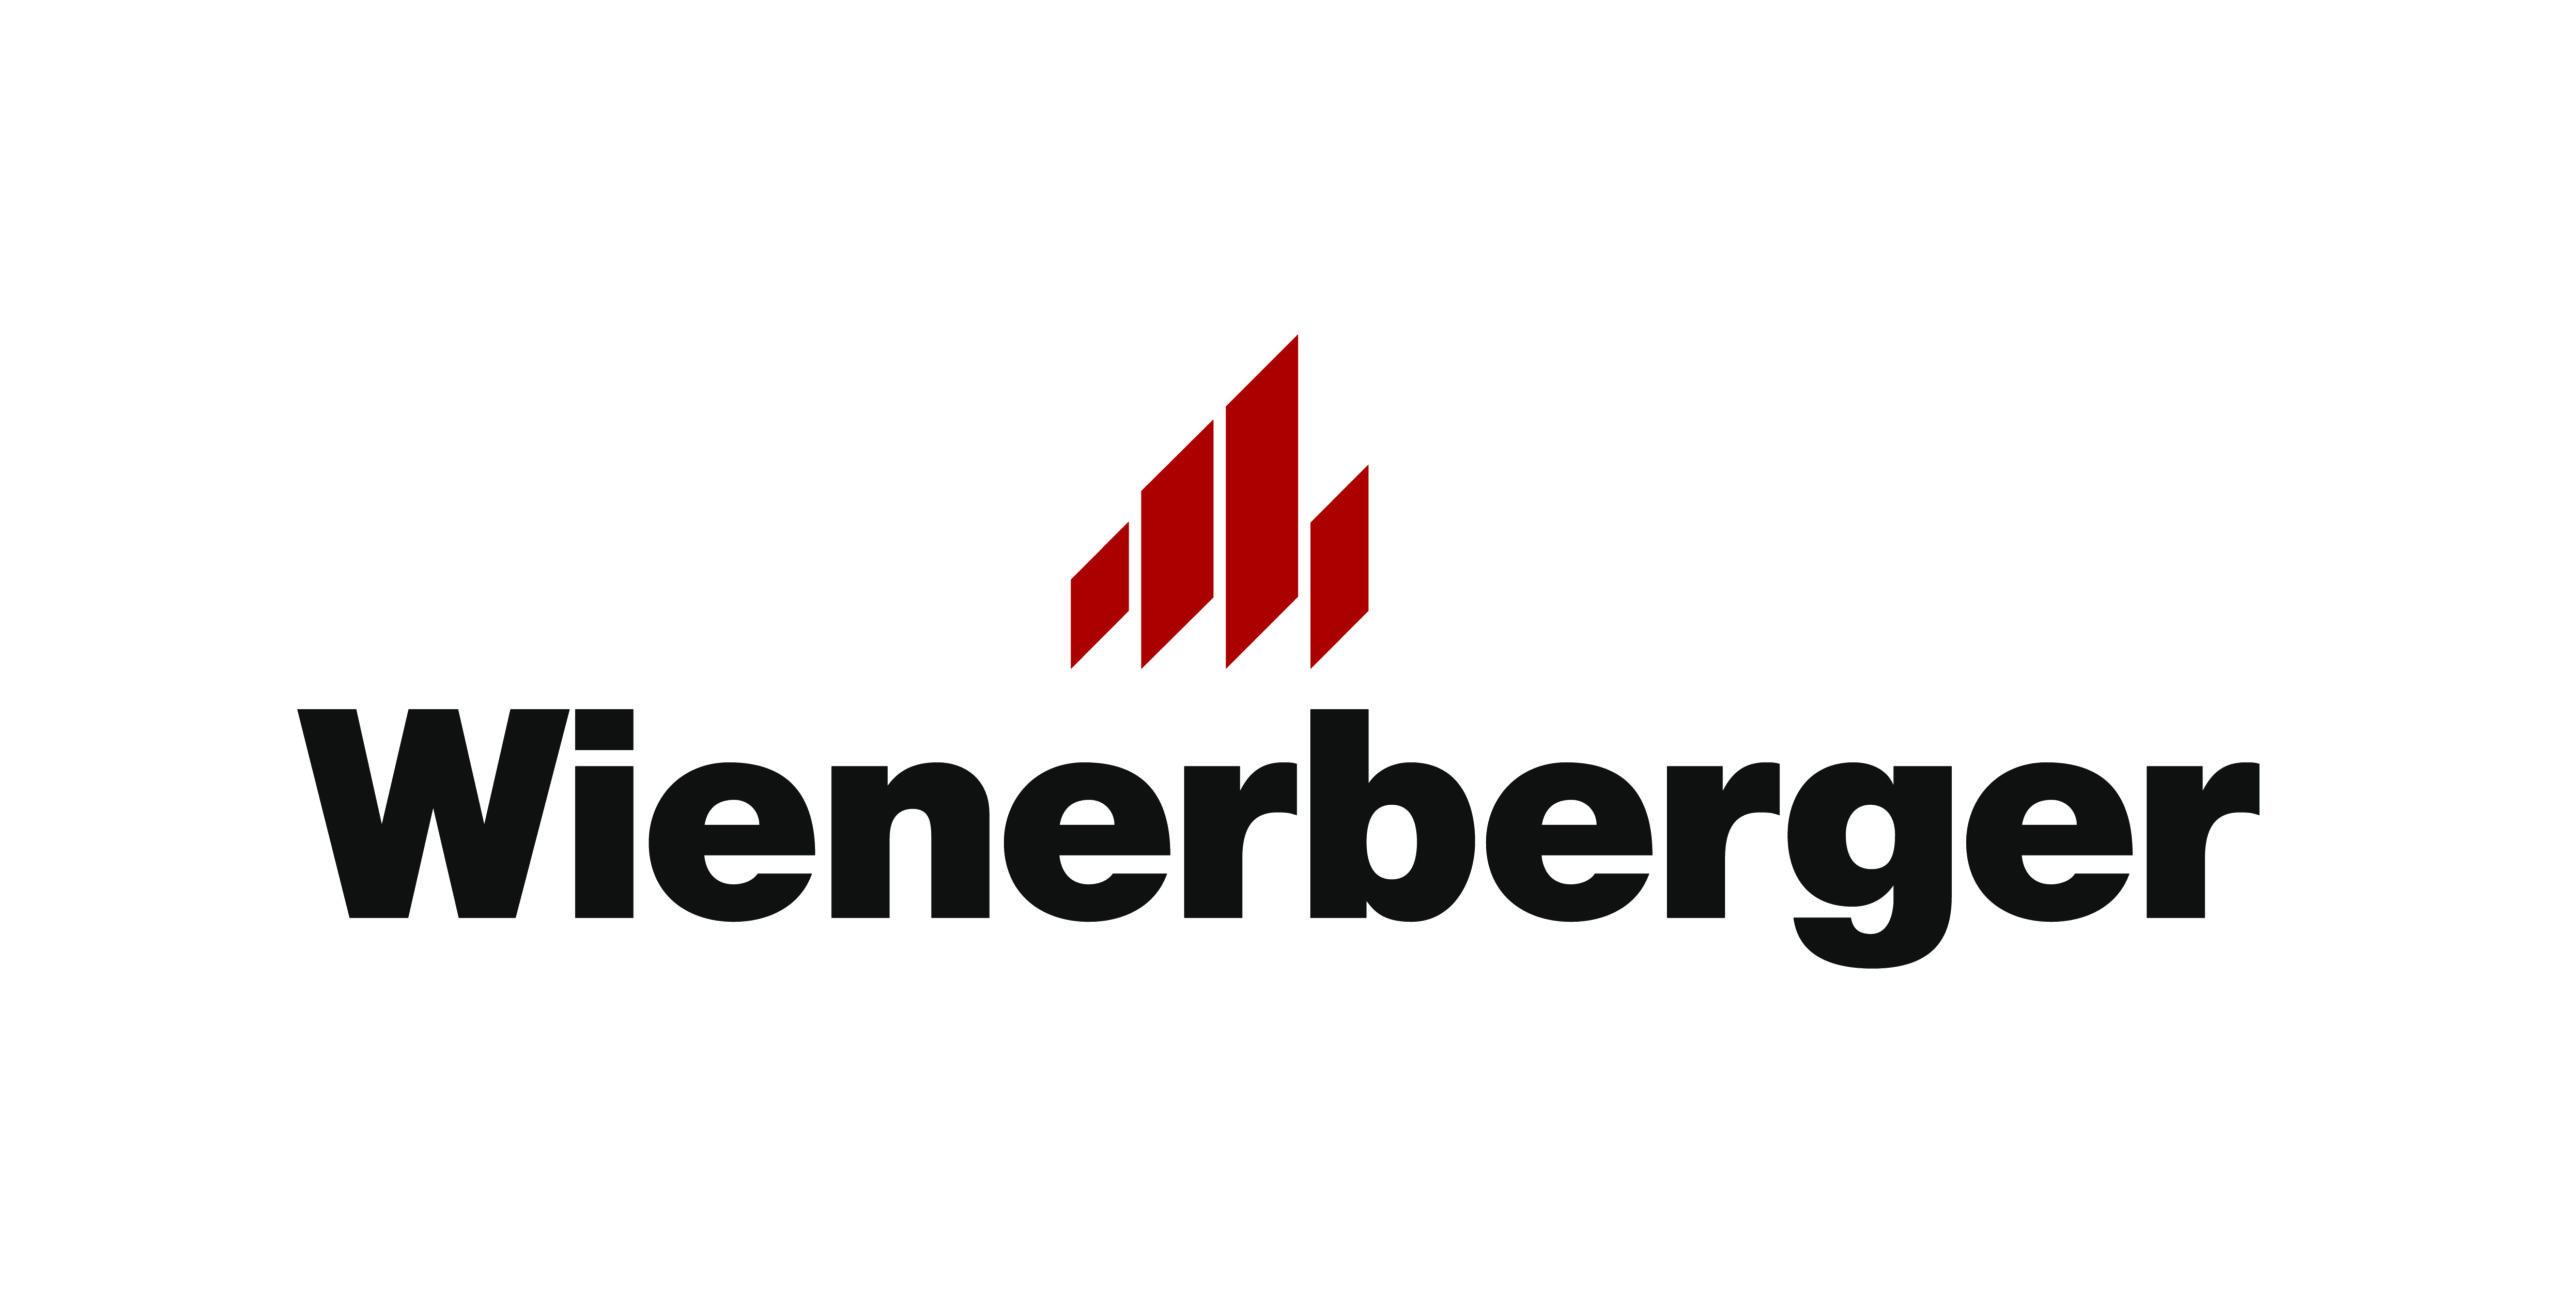 Wienerberger AS